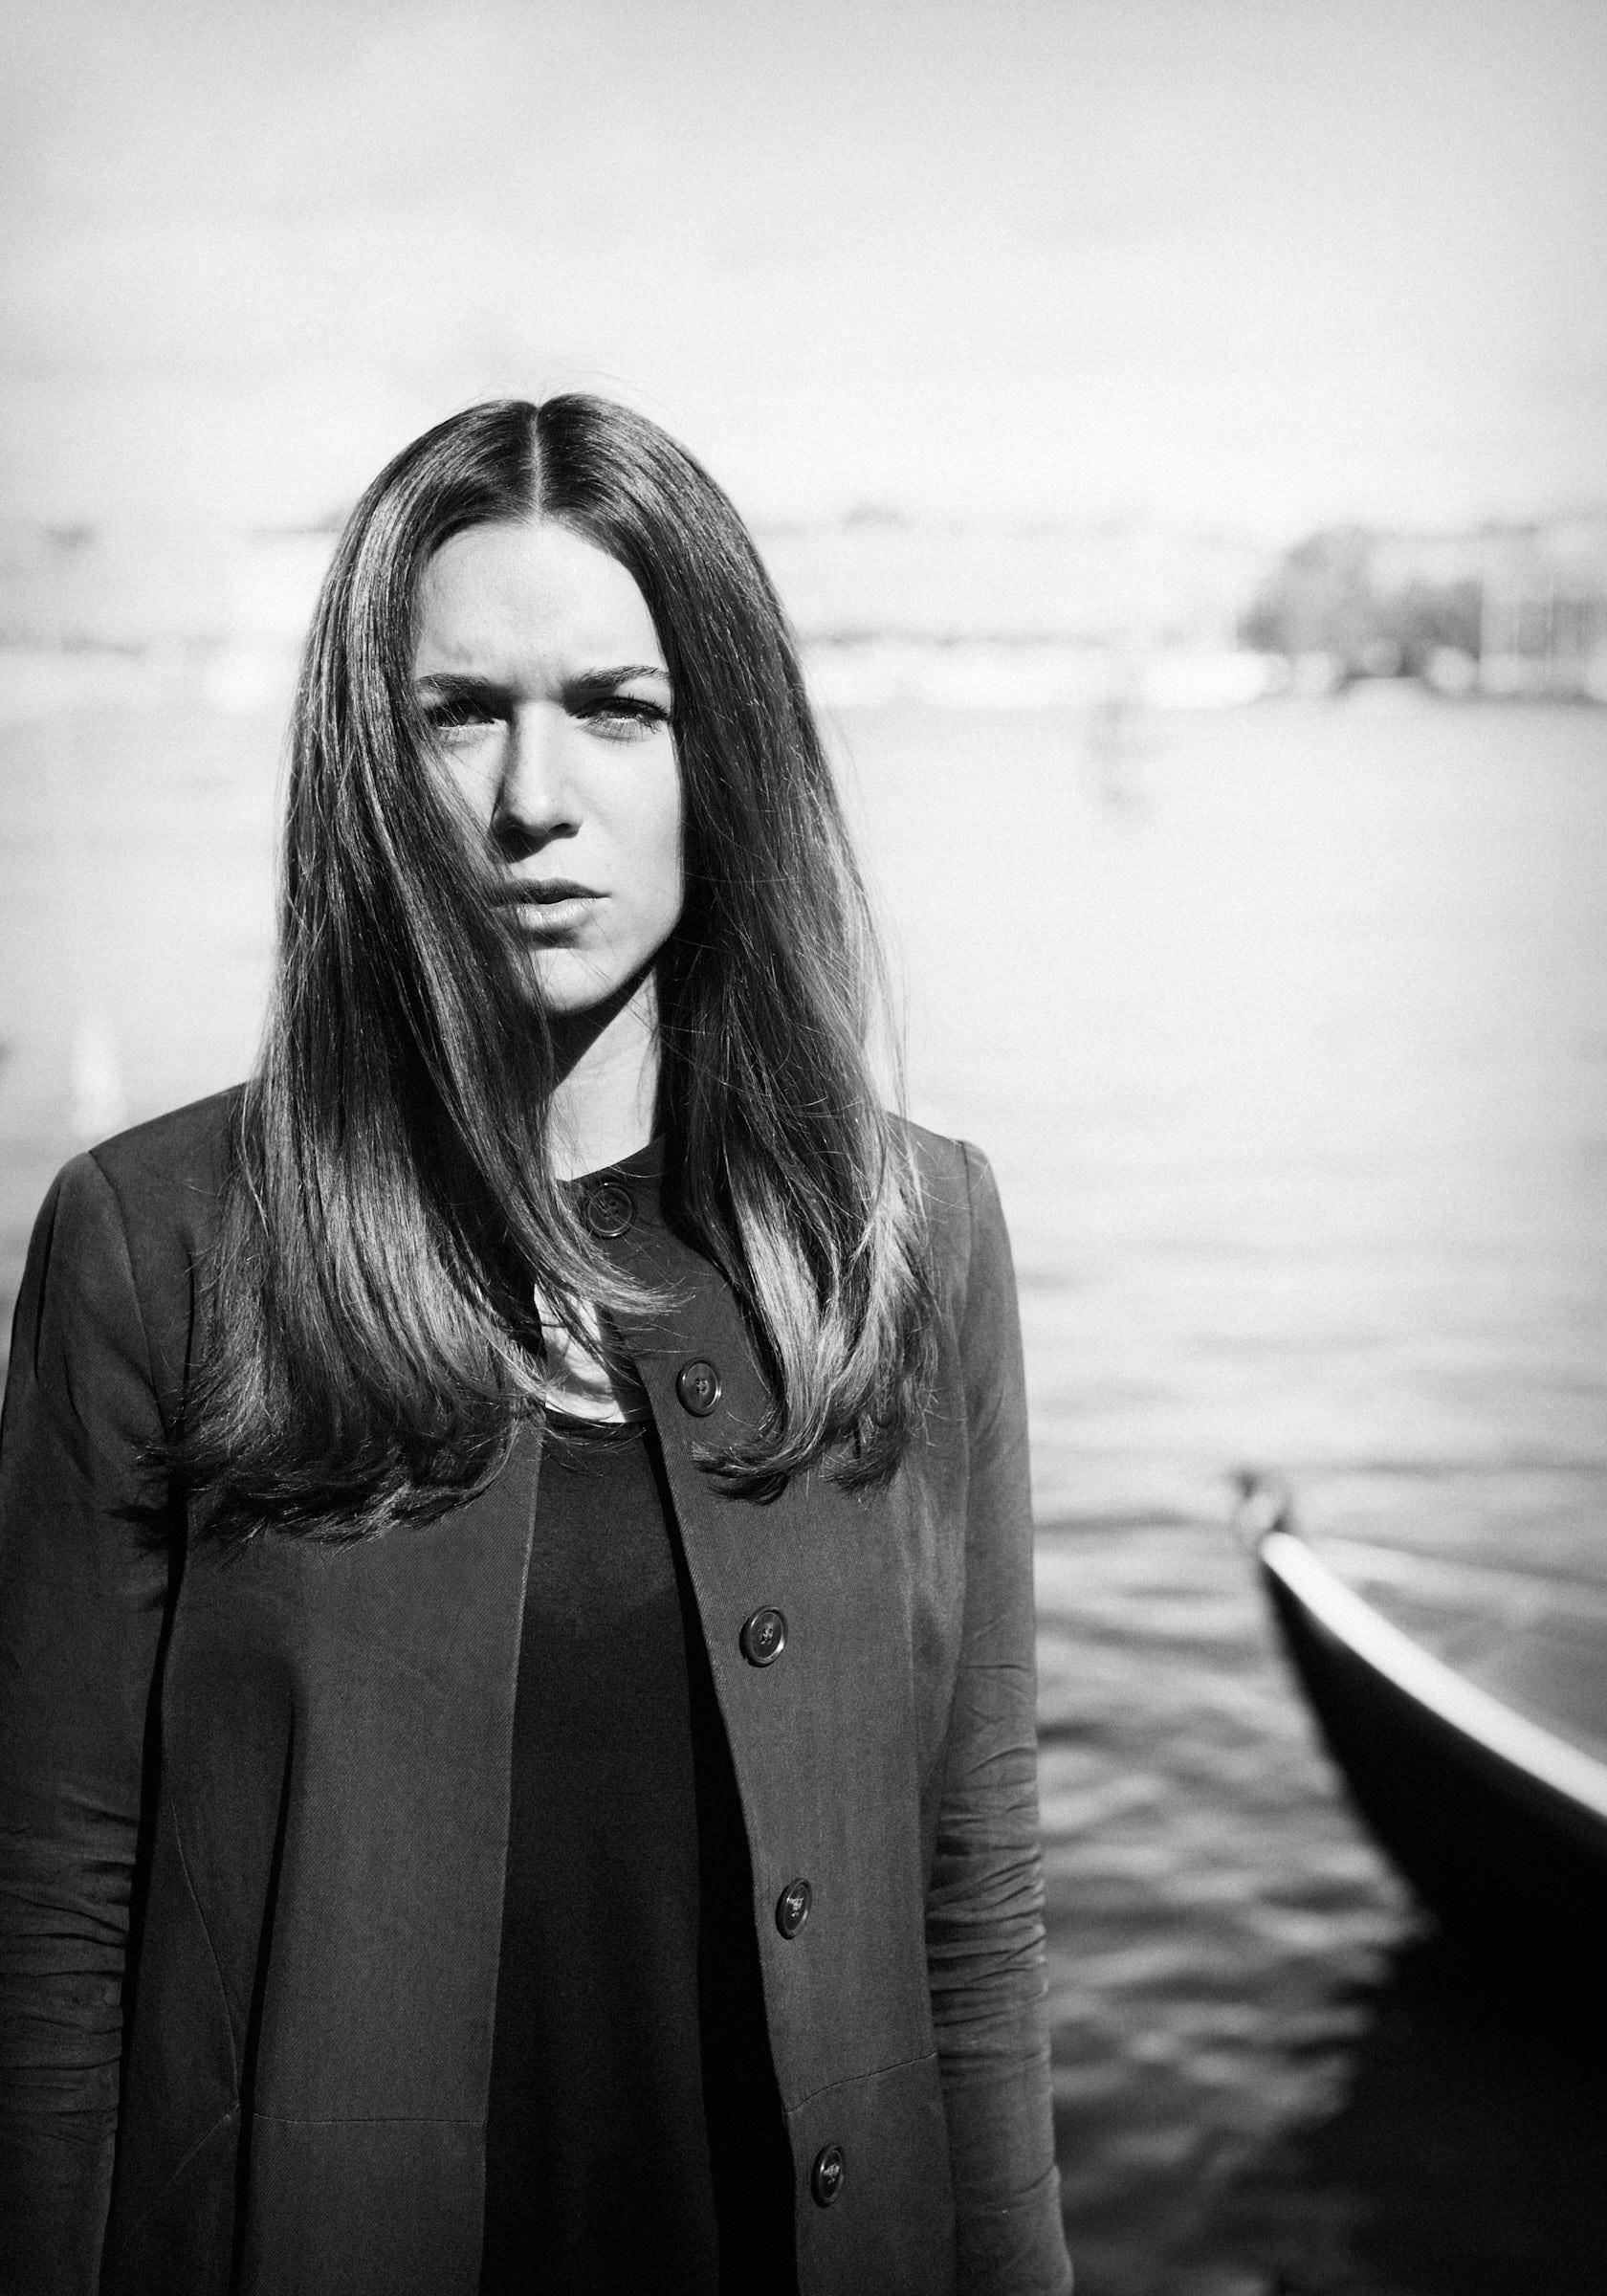 Portfolio_470_Portrait of Melissa Horn_GP_KRISTOFER SAMUELSSON PHOTOGRAPHY.jpg